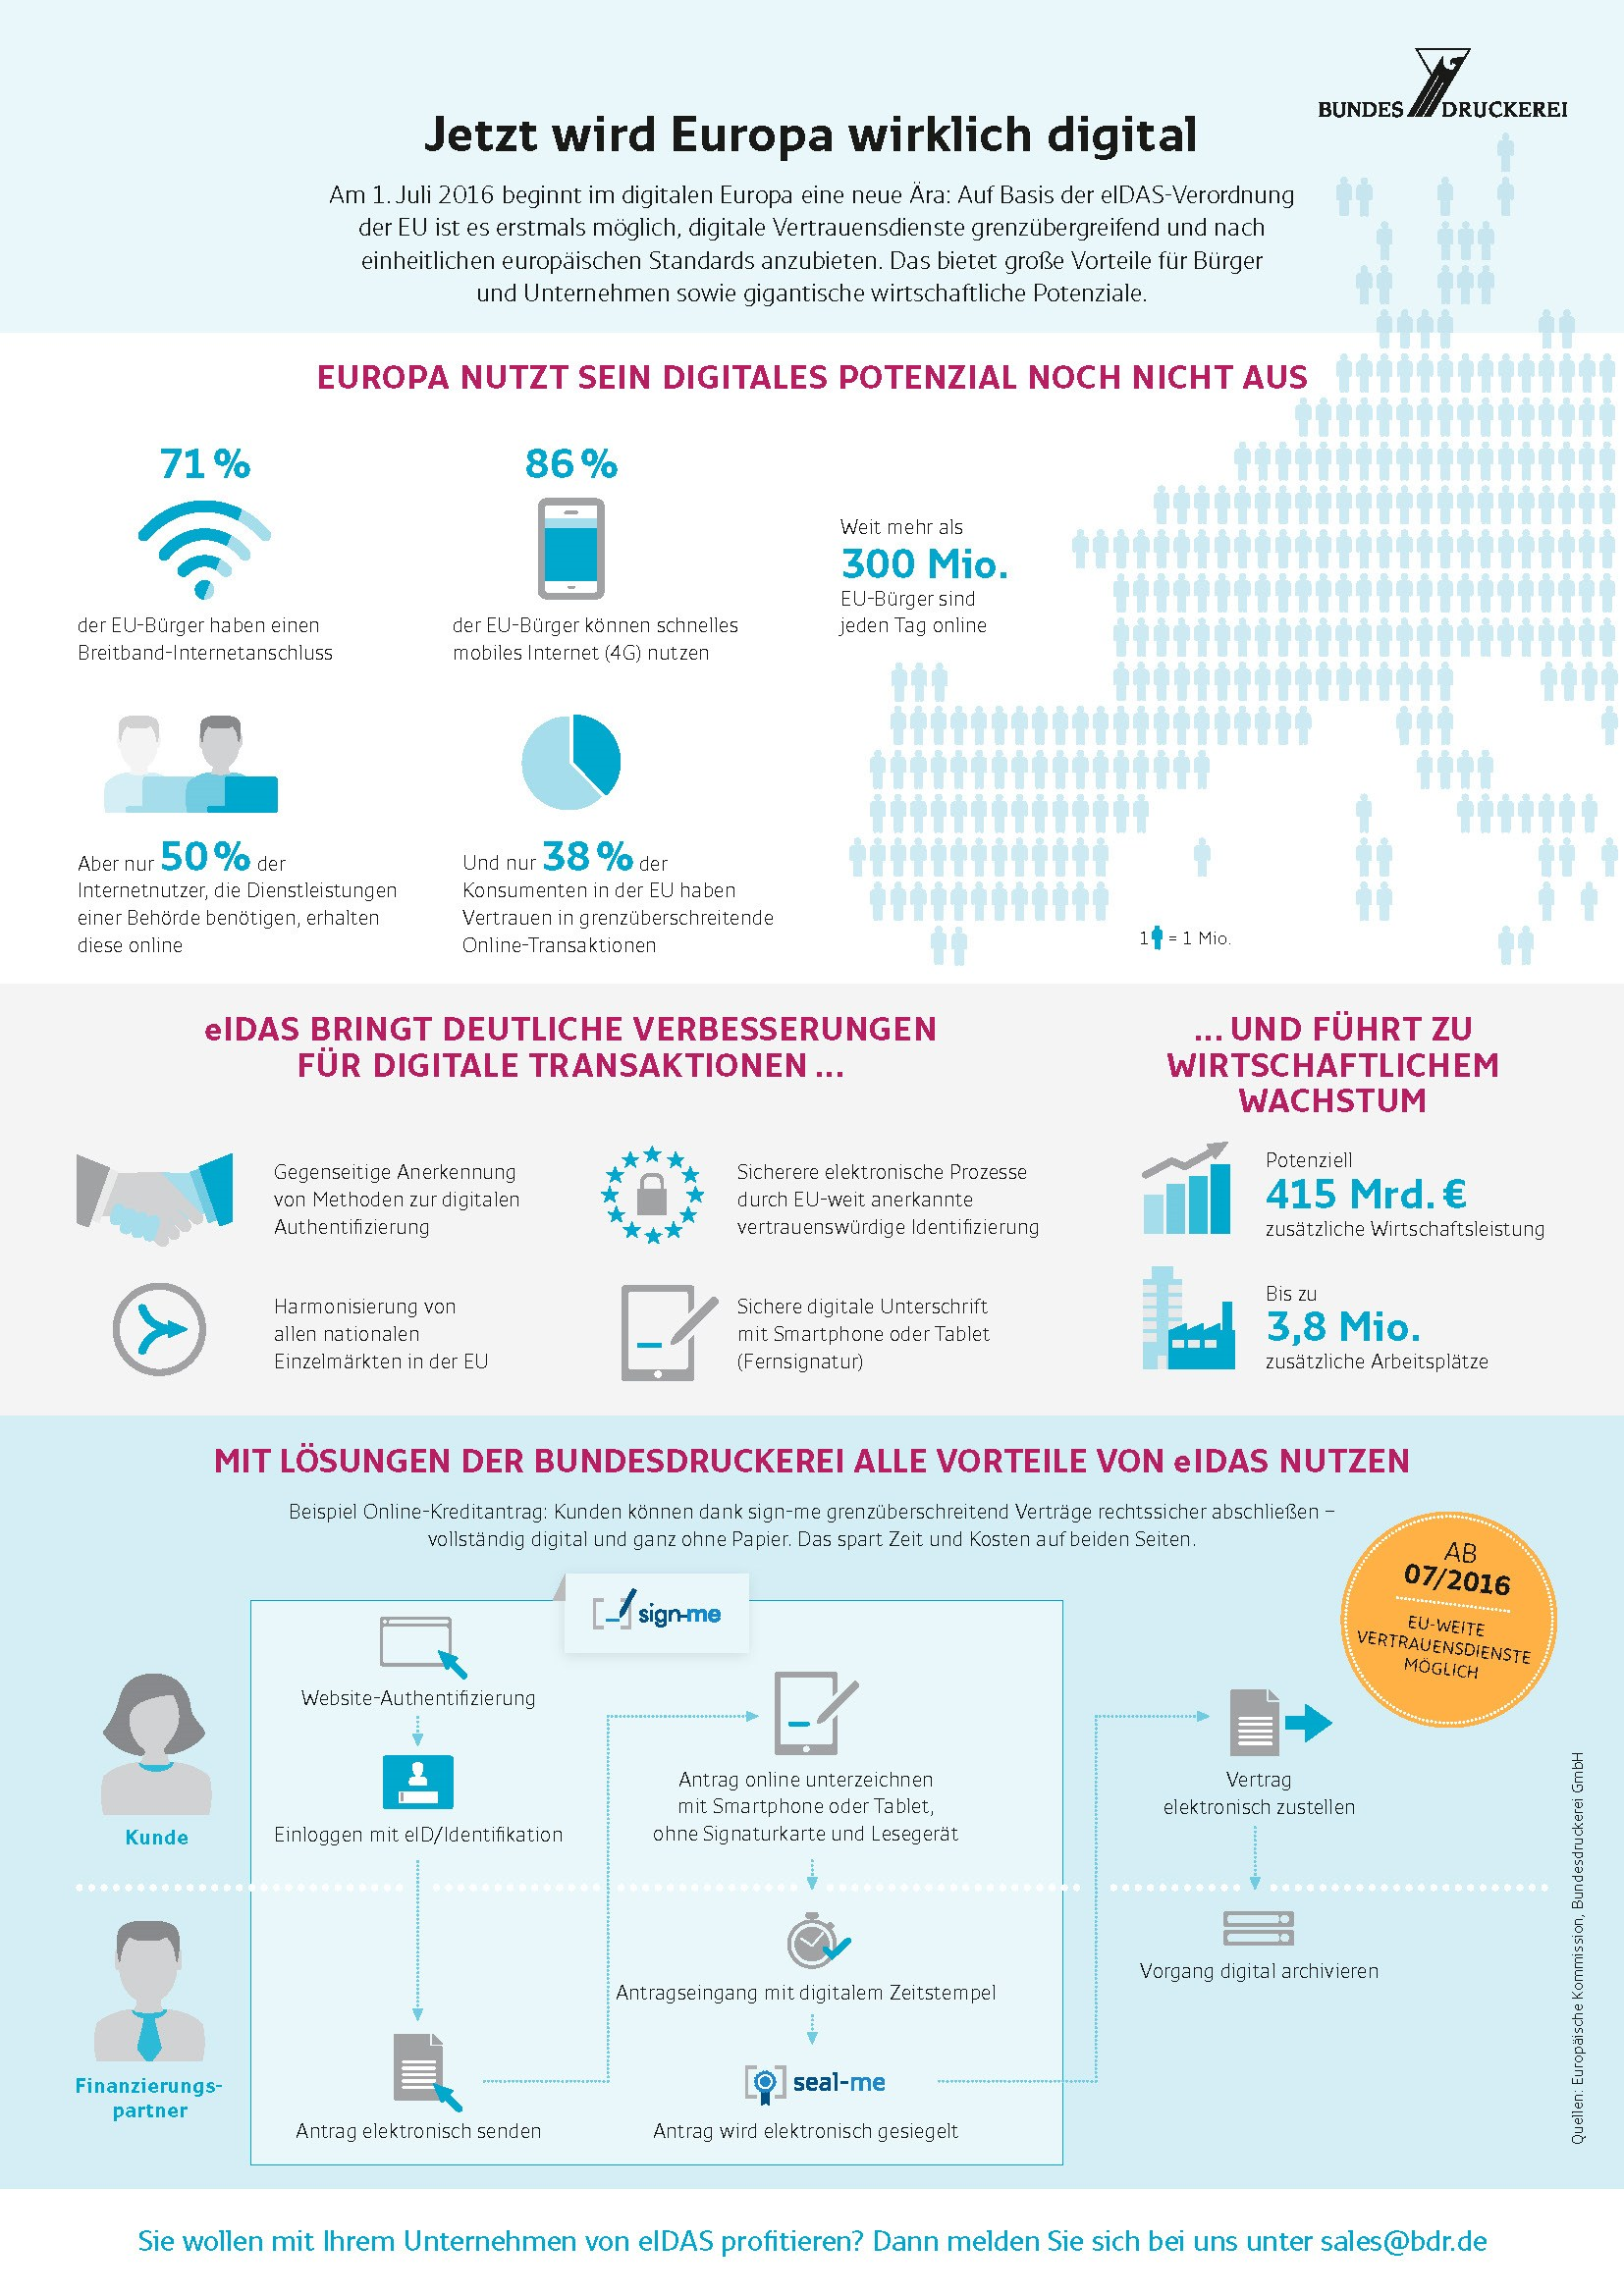 infografik bundesdruckerei eldas transaktionen